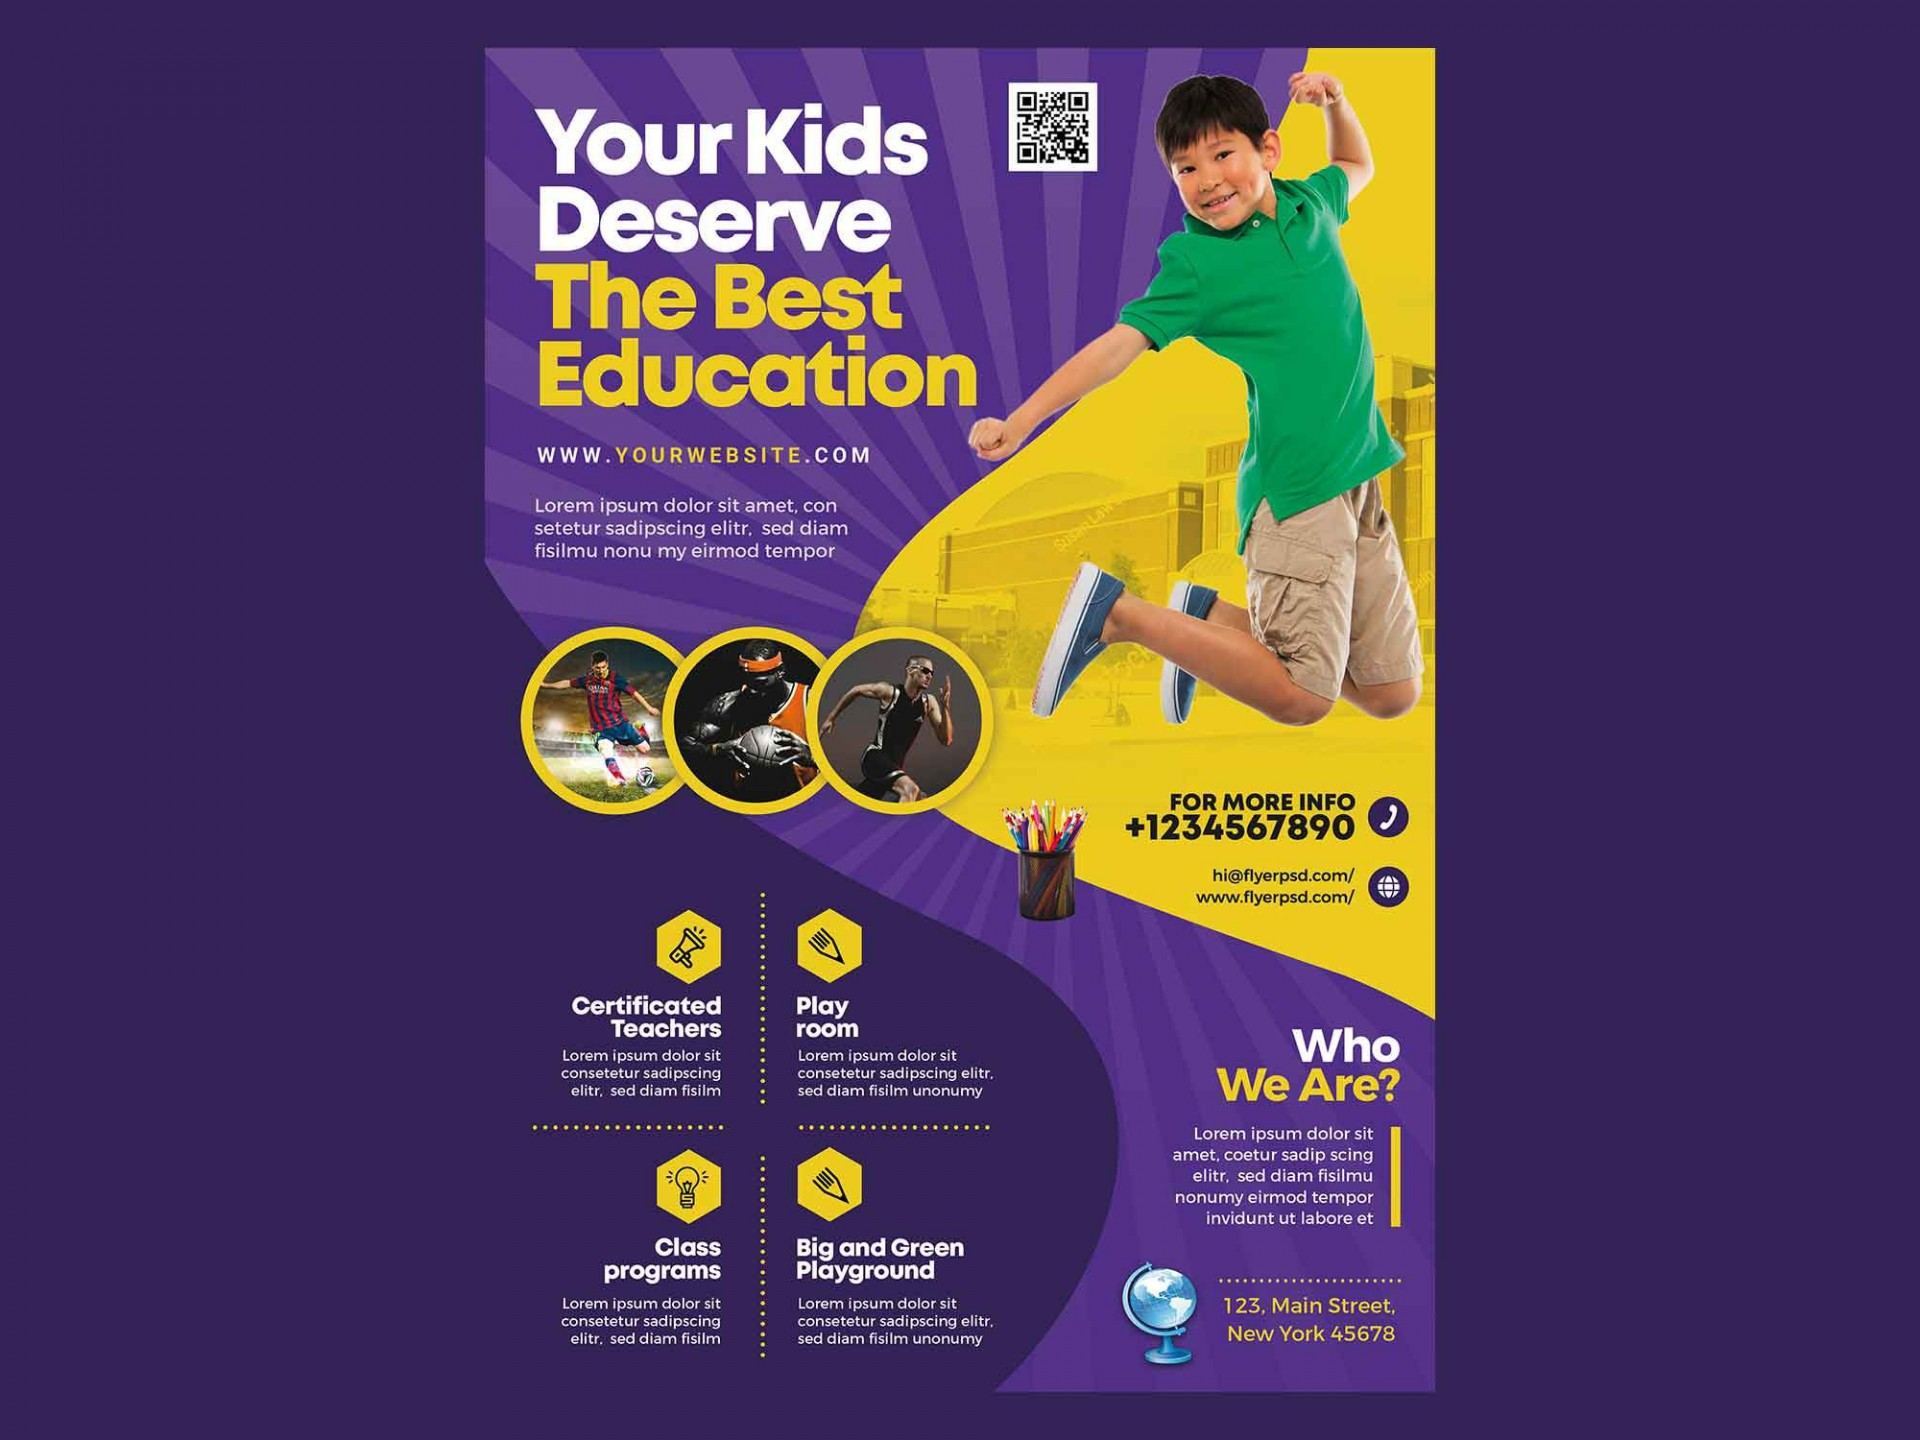 005 Rare Free School Flyer Design Template Concept  Templates Creative Education Poster1920